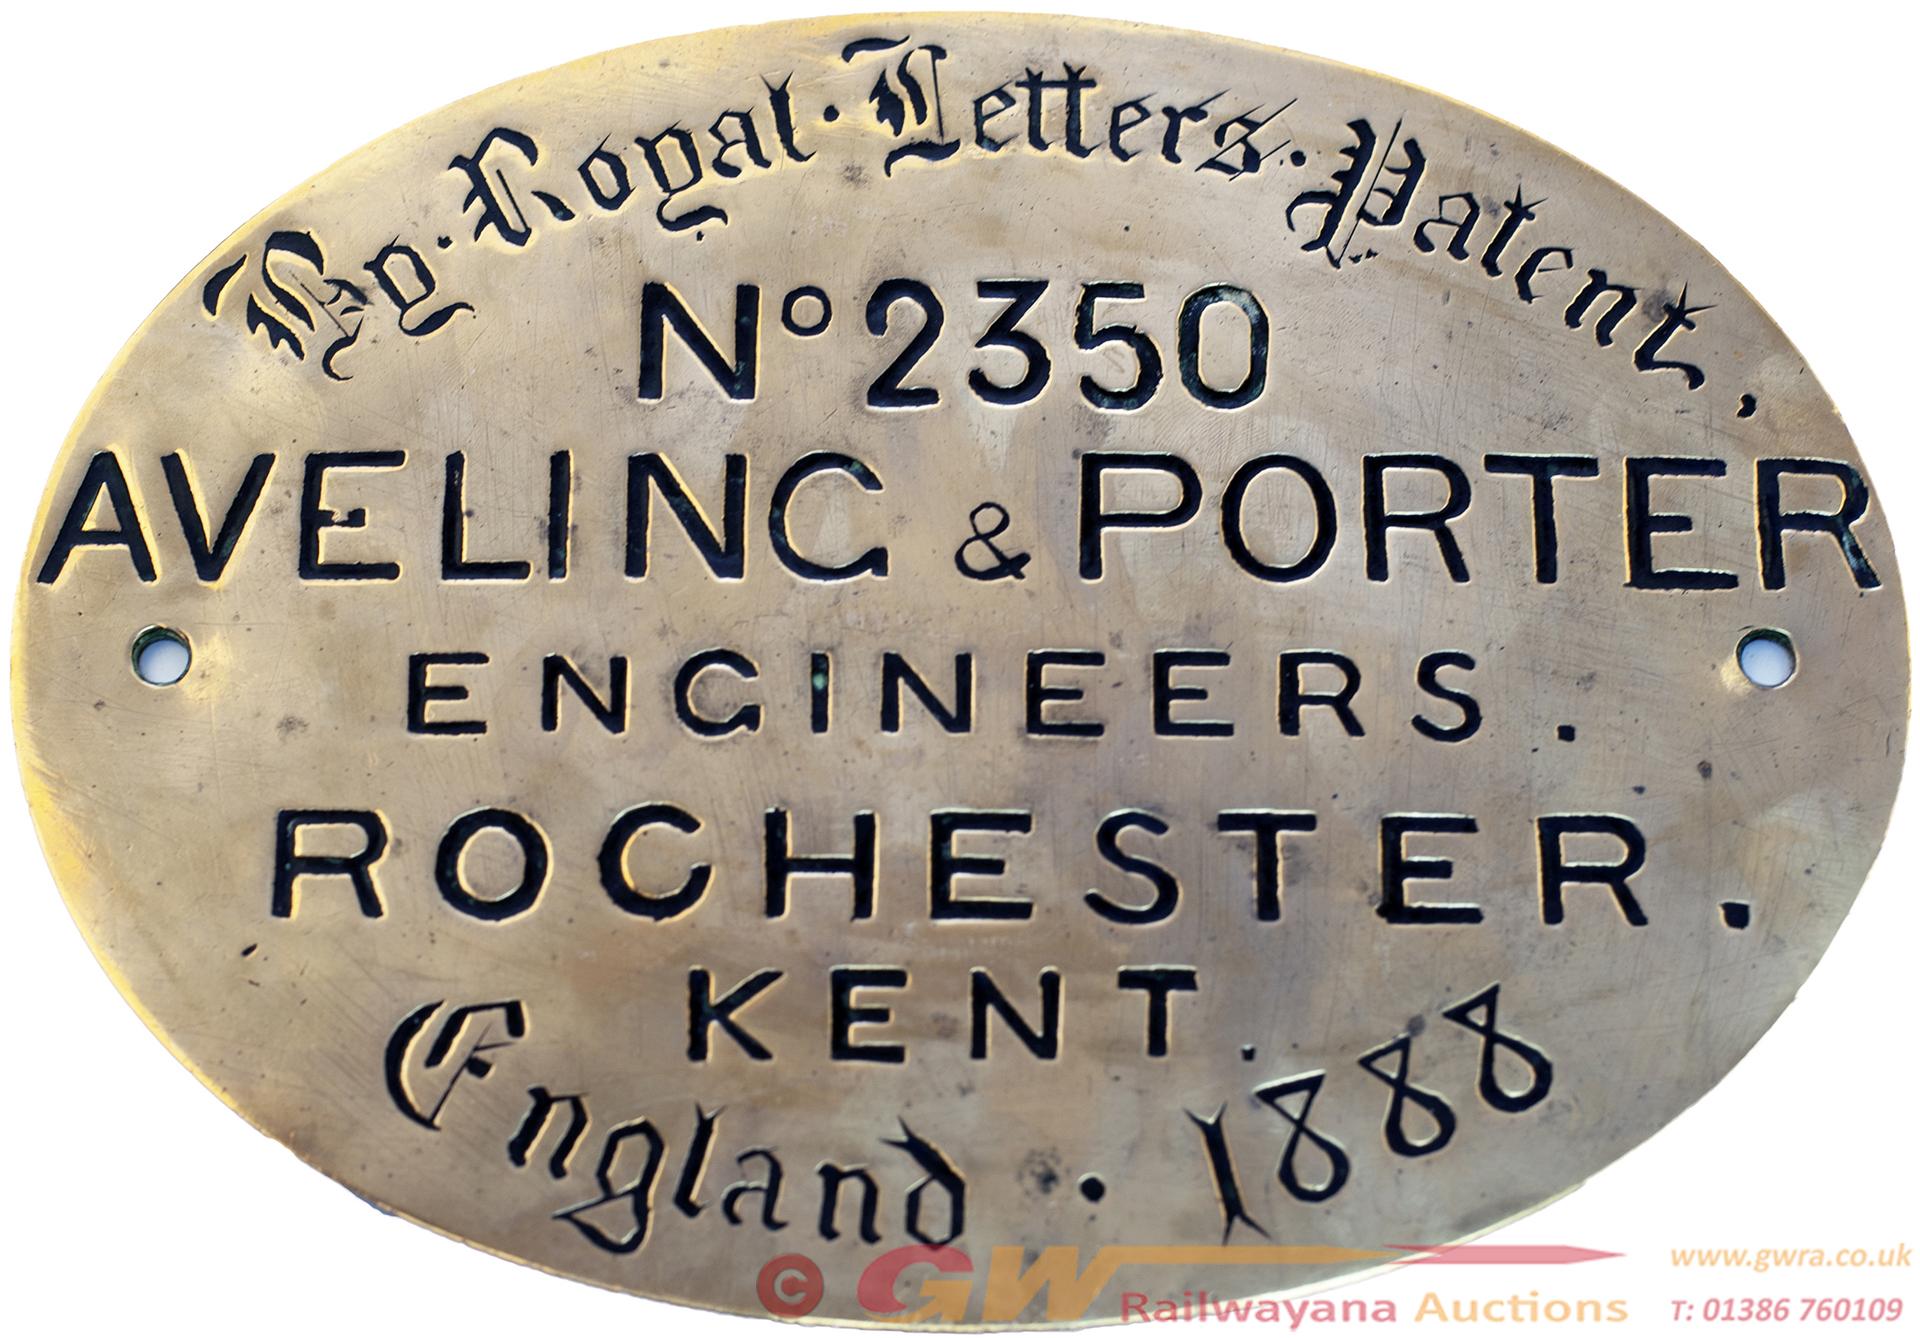 Worksplate AVELING & PORTER ENGINEERS ROCHESTER